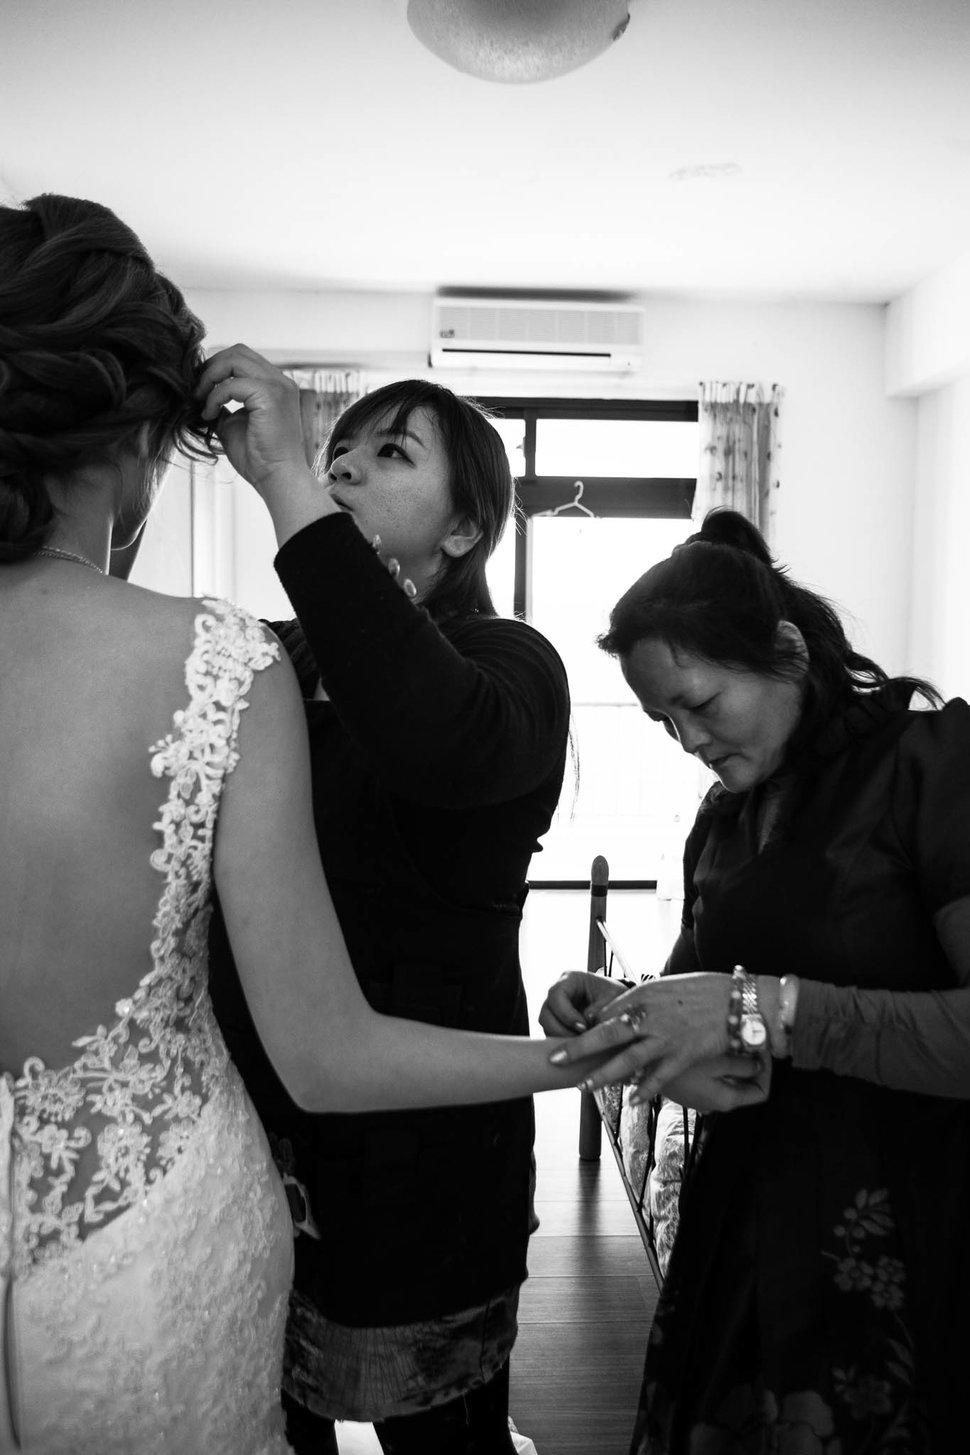 18PHOTO-大育❤️ 小汝(花園婚禮)(編號:225981) - 18PHOTO 婚紗影像攝影工作室 - 結婚吧一站式婚禮服務平台